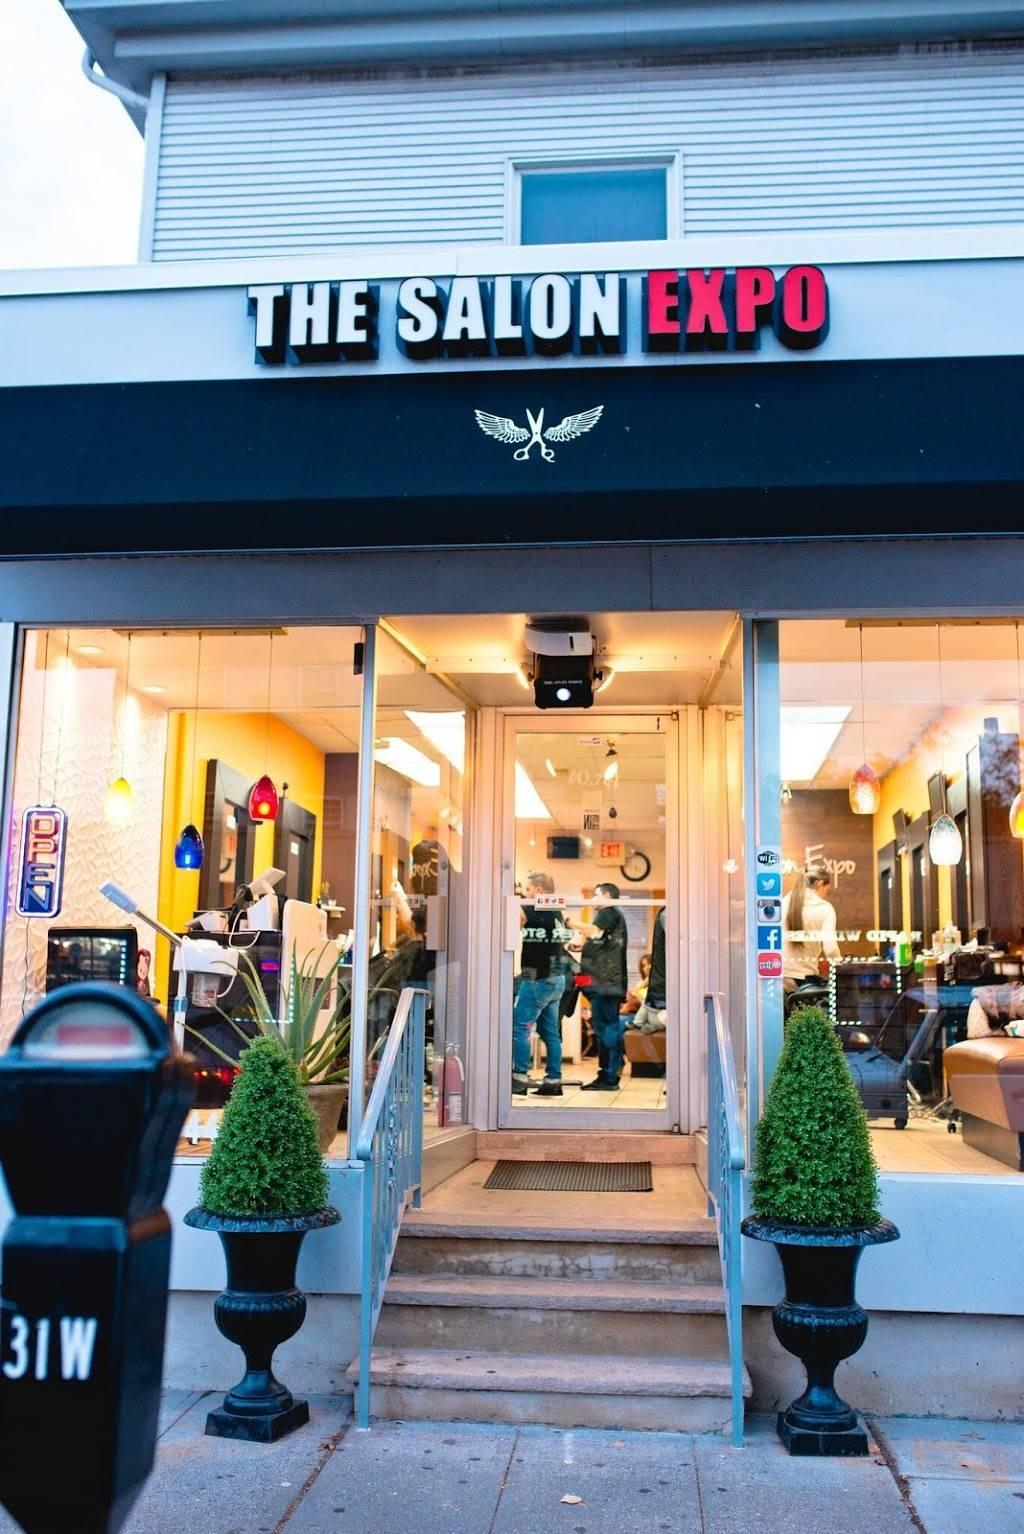 The Salon Expo | restaurant | 76 W Palisade Ave, Englewood, NJ 07631, USA | 2015694409 OR +1 201-569-4409